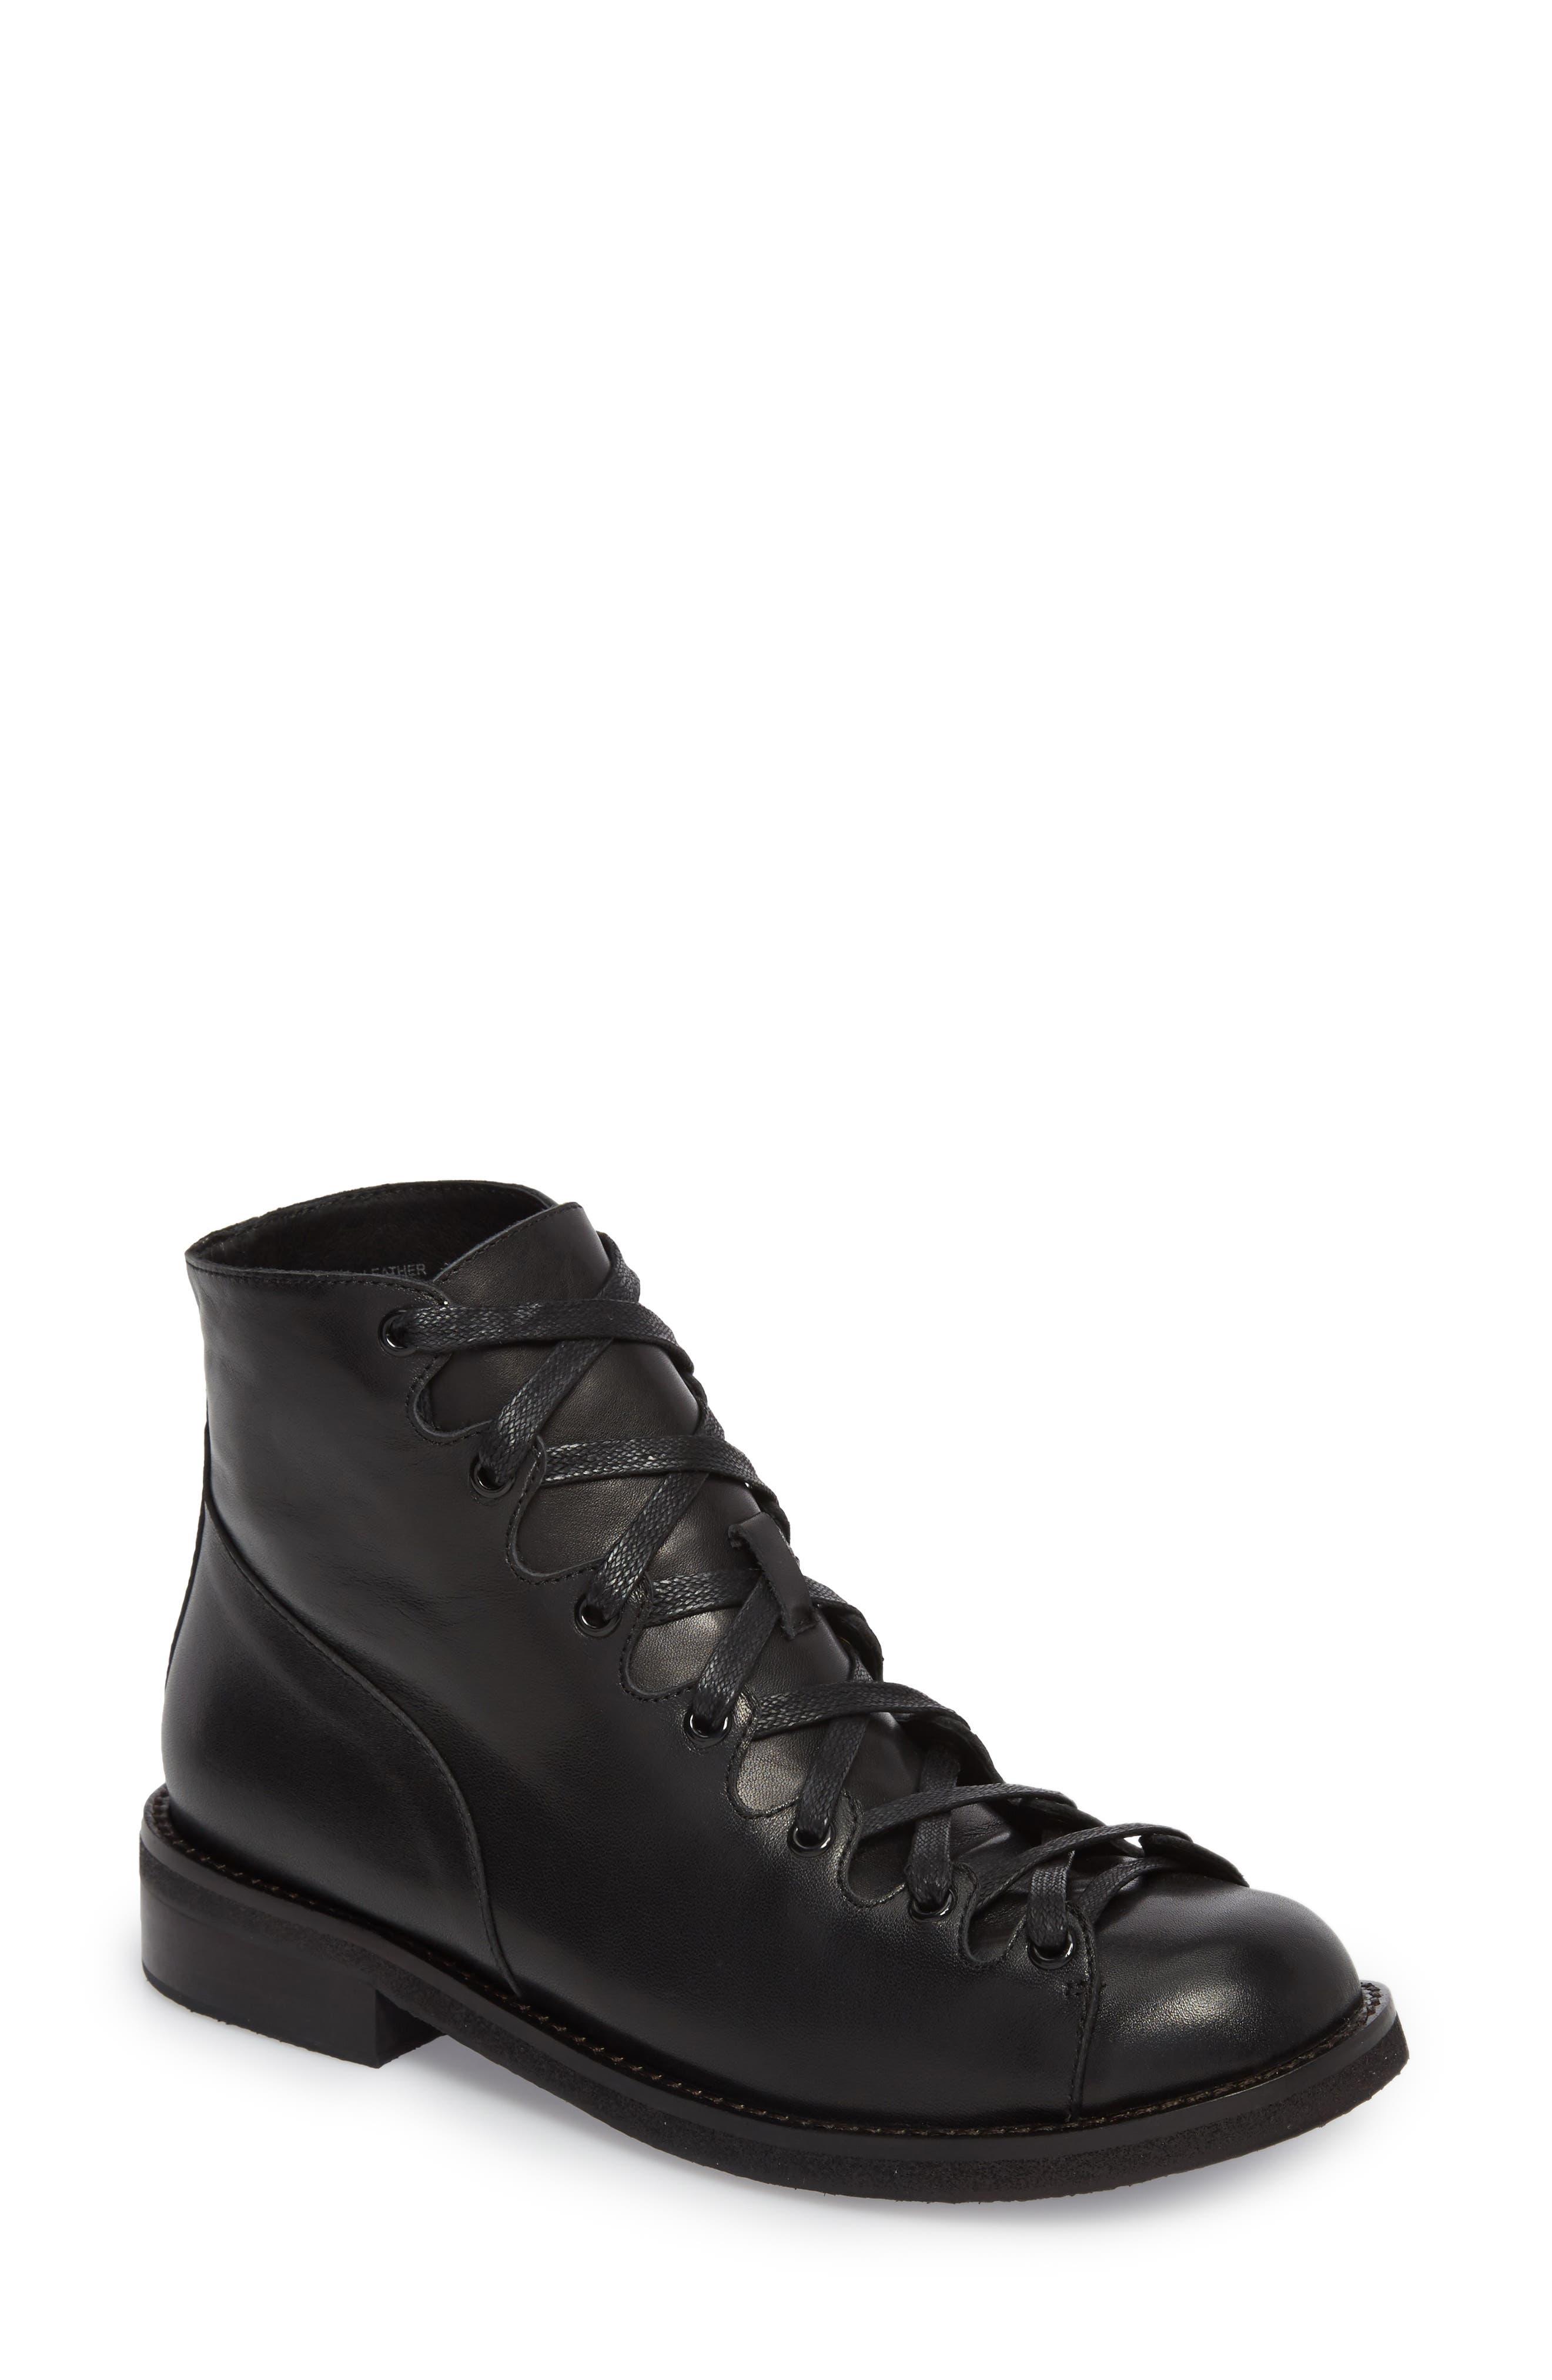 Grey City Jess Ghillie Combat Boot (Women)